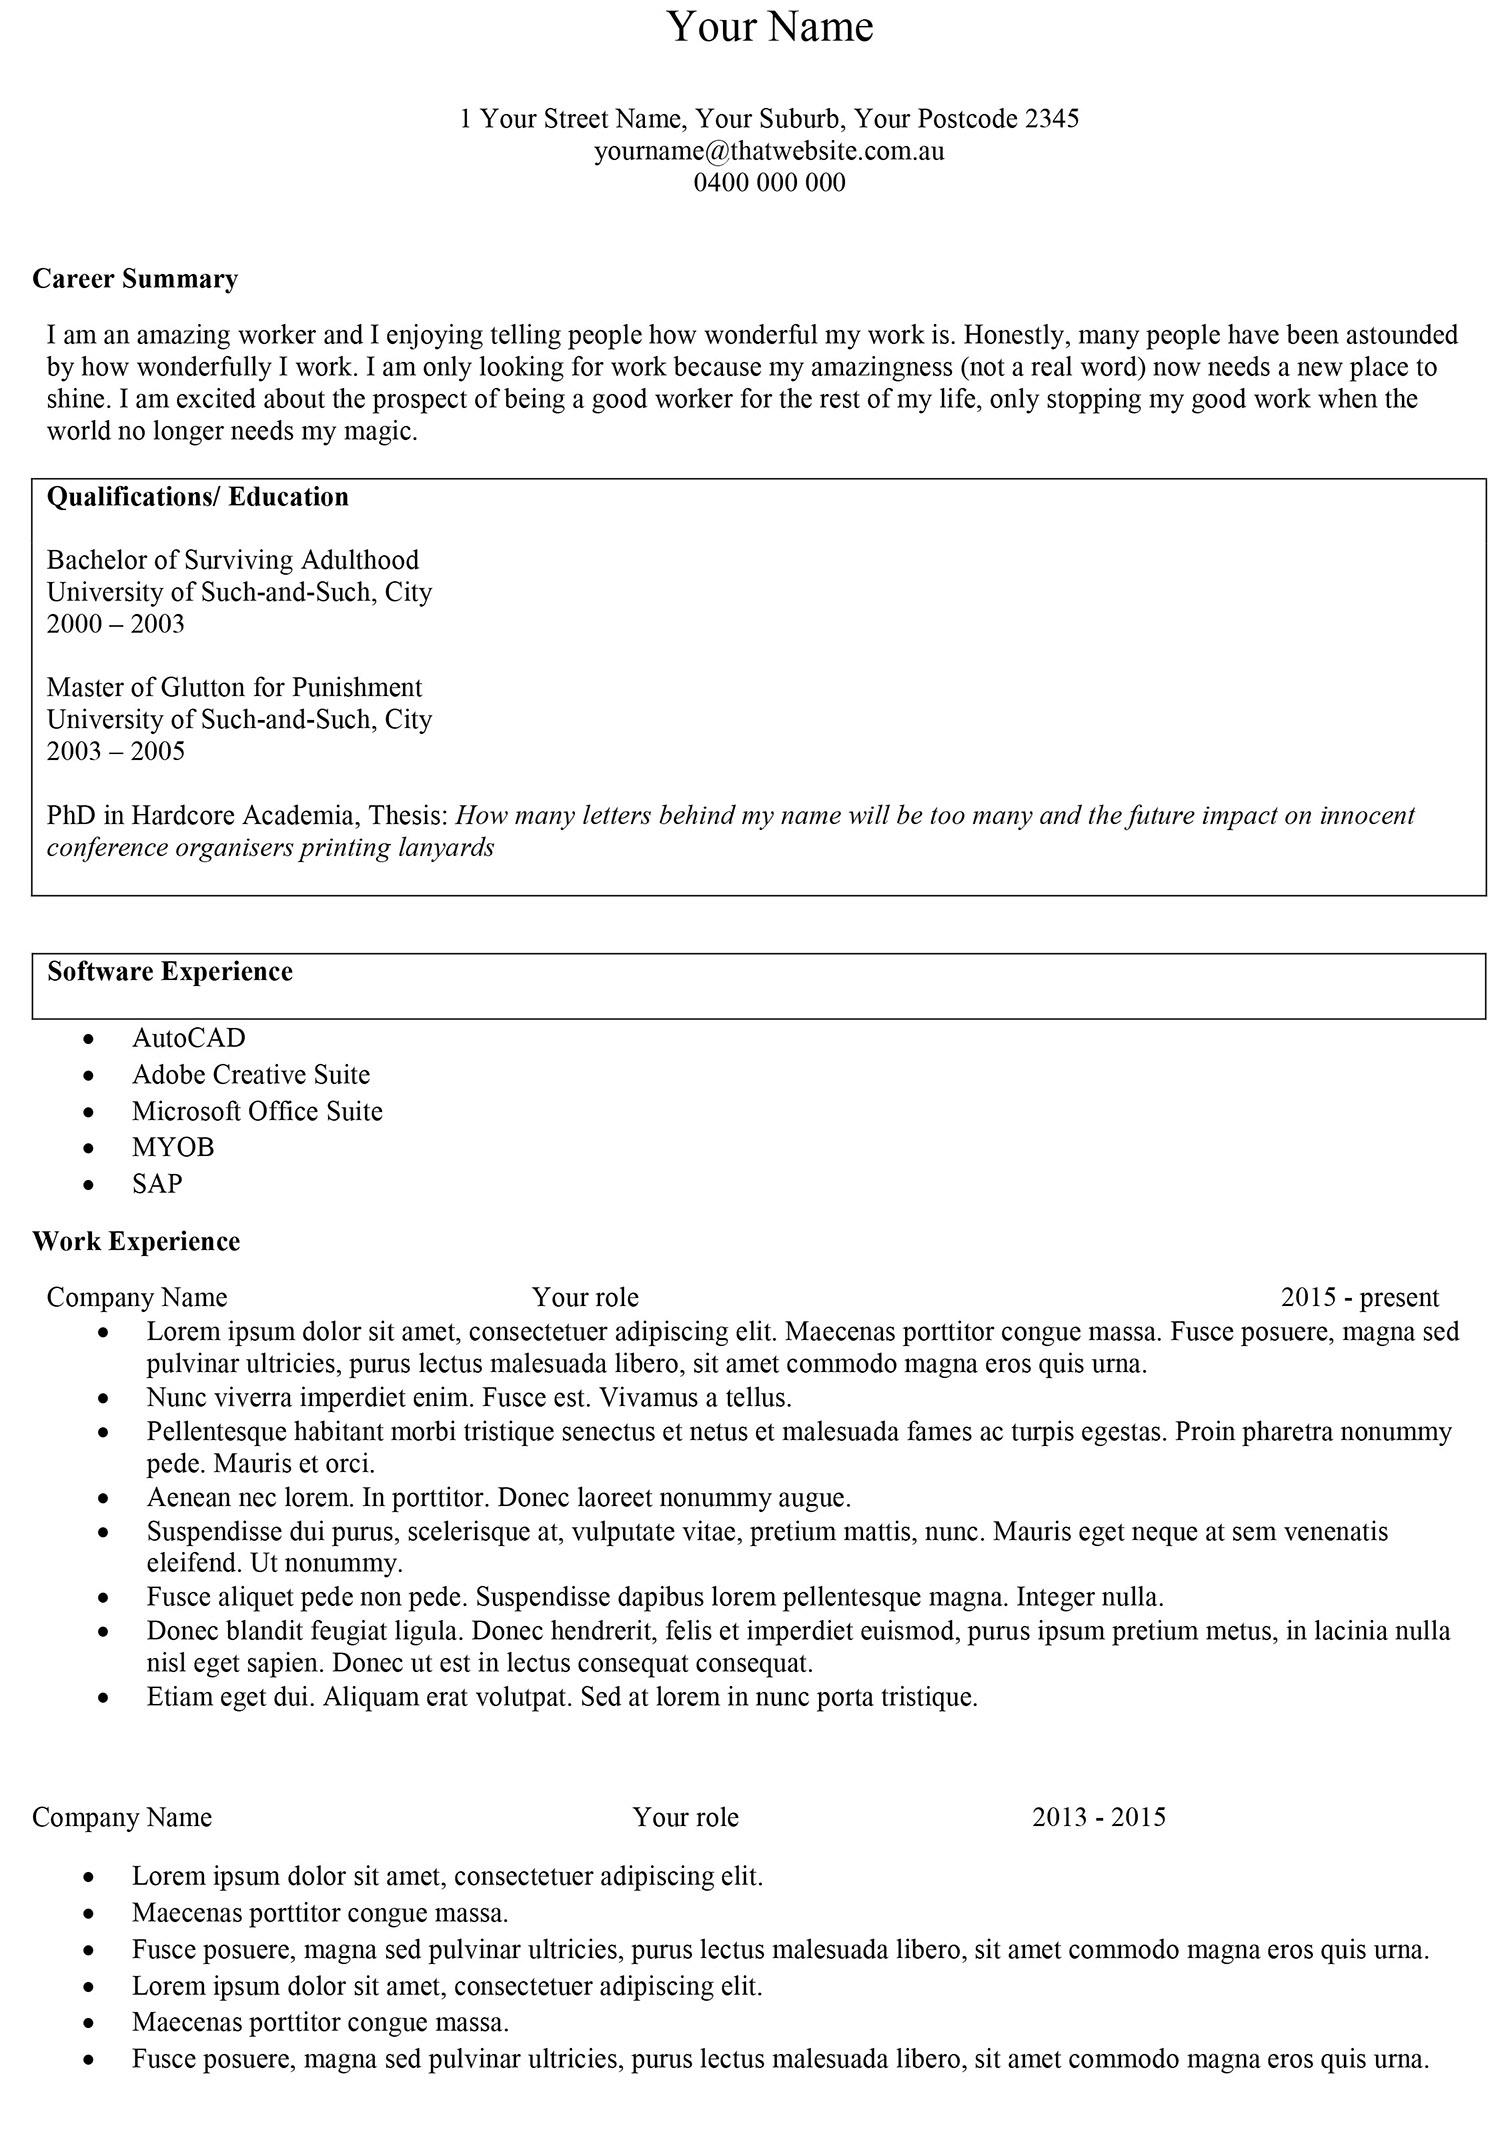 1. Your Name Resume Word Template Screenshot